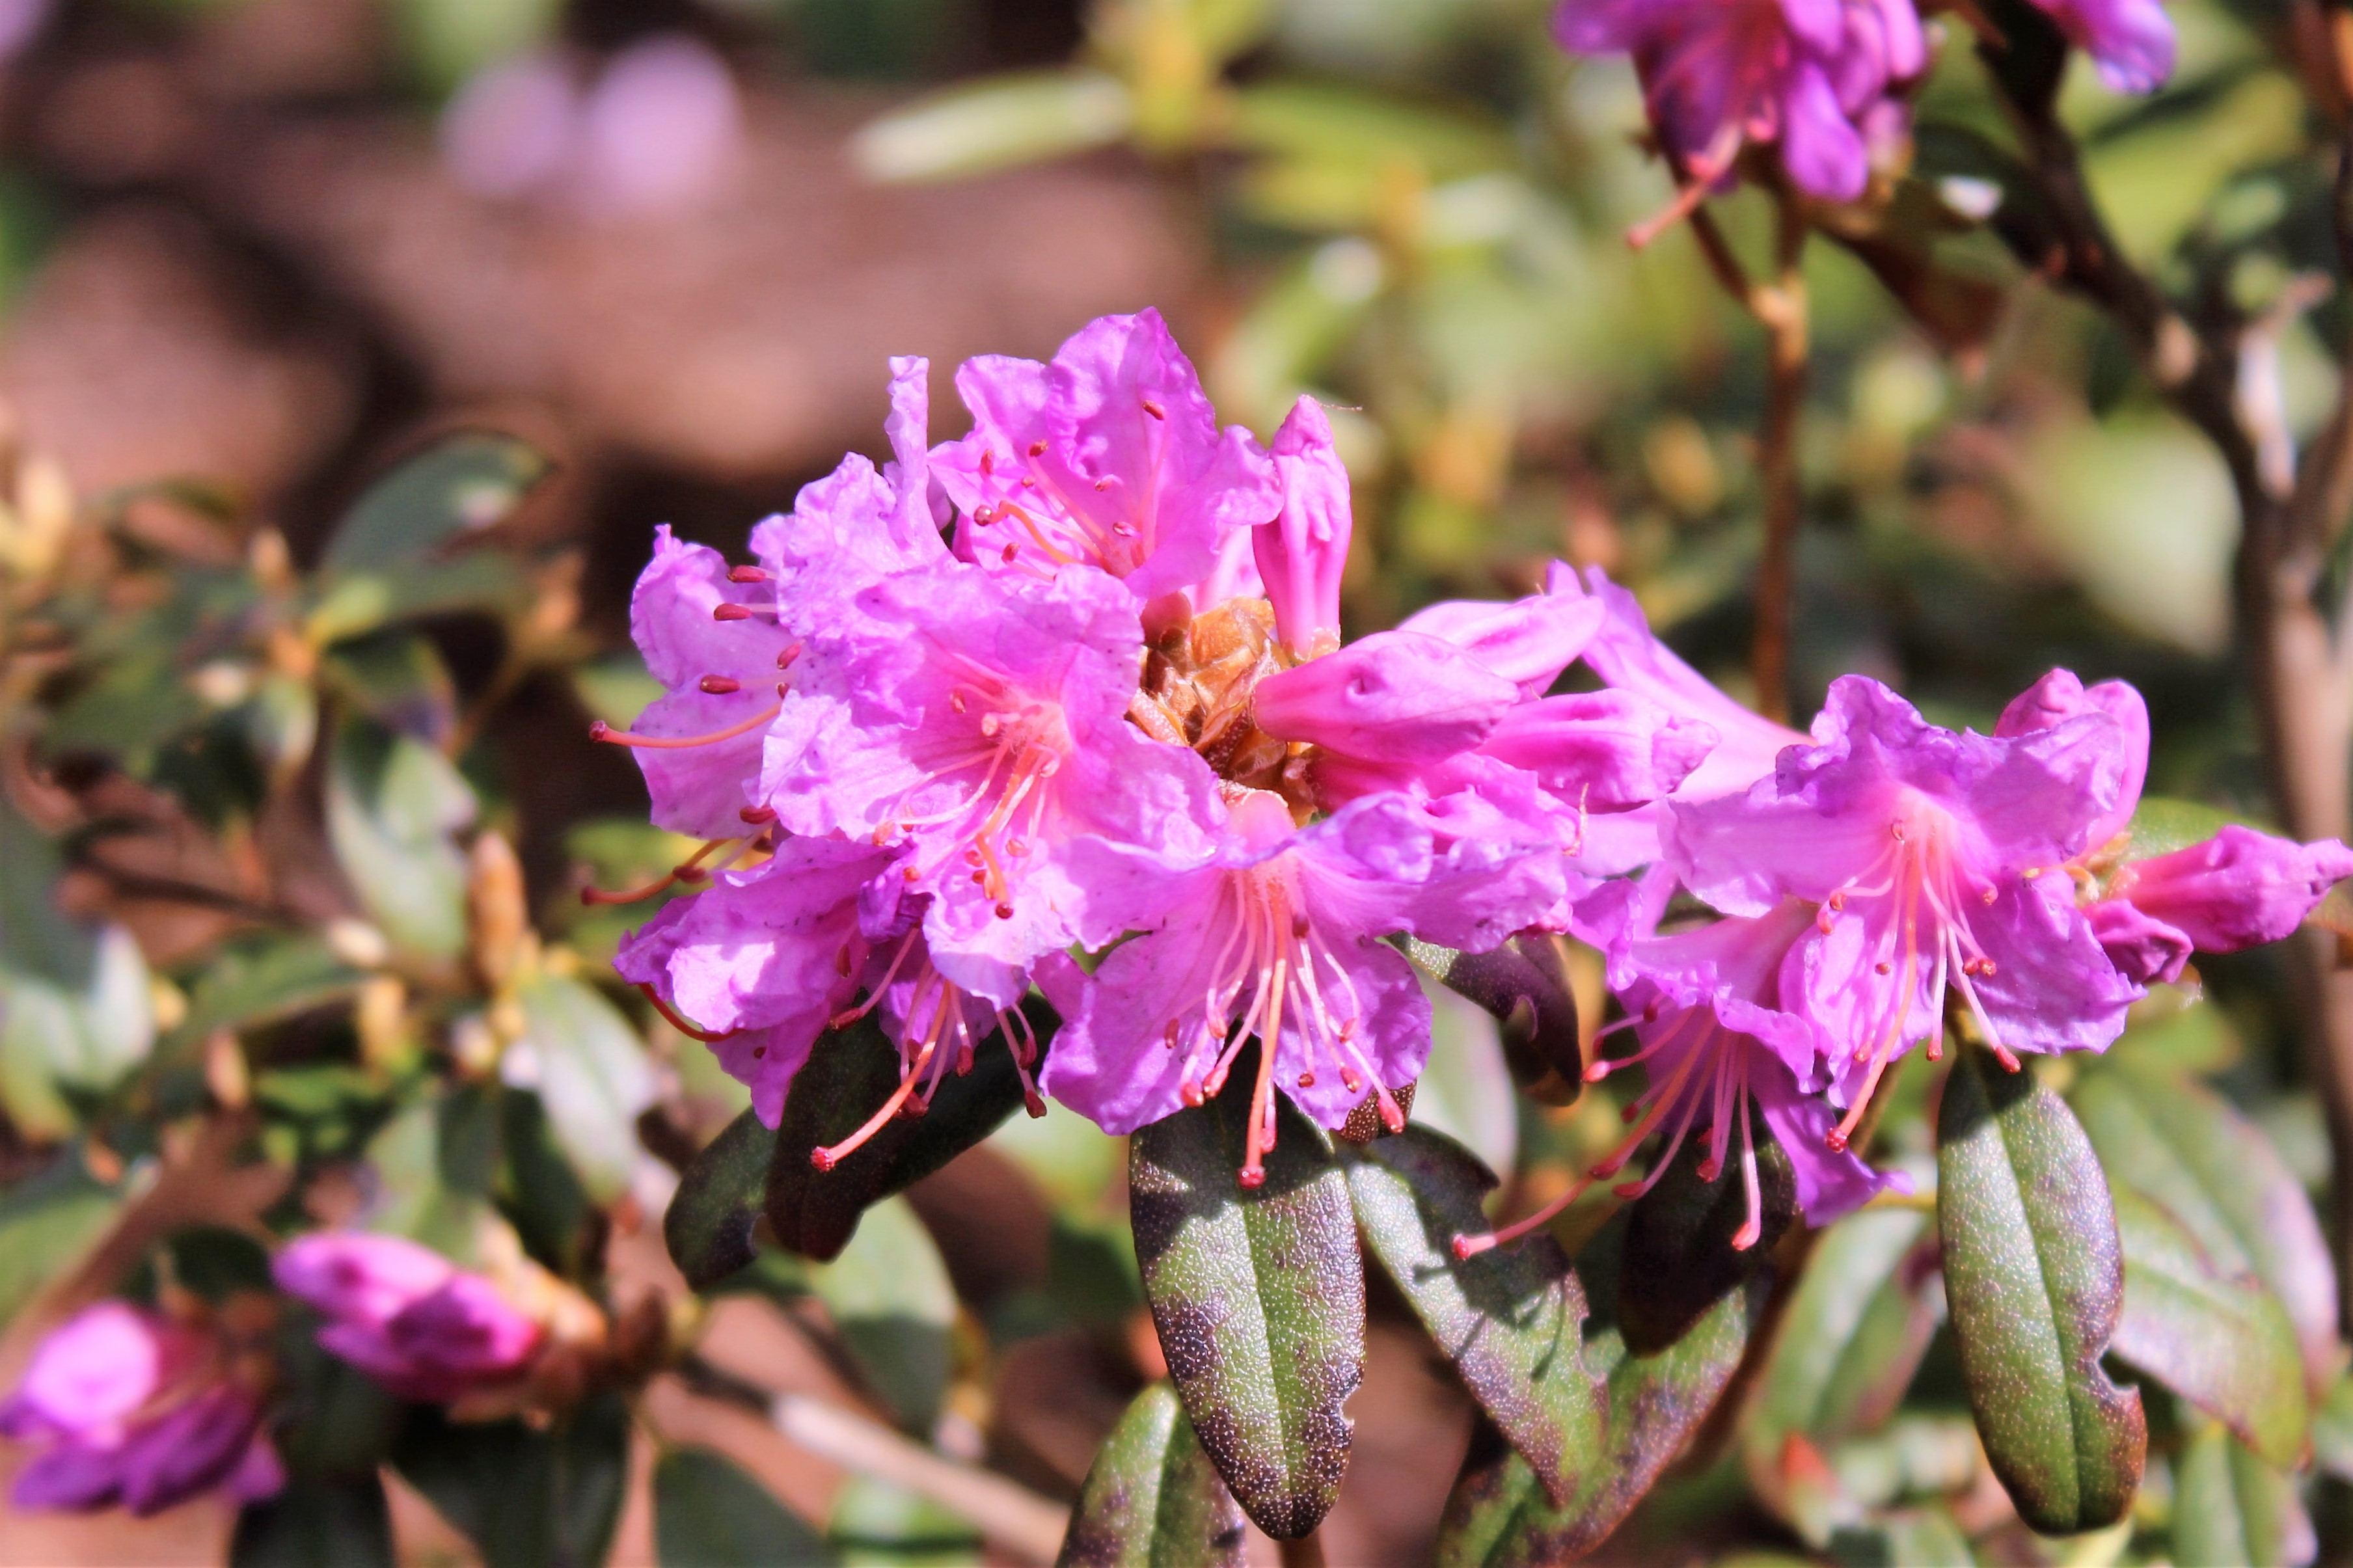 Rh. augustinii ssp. augustinii